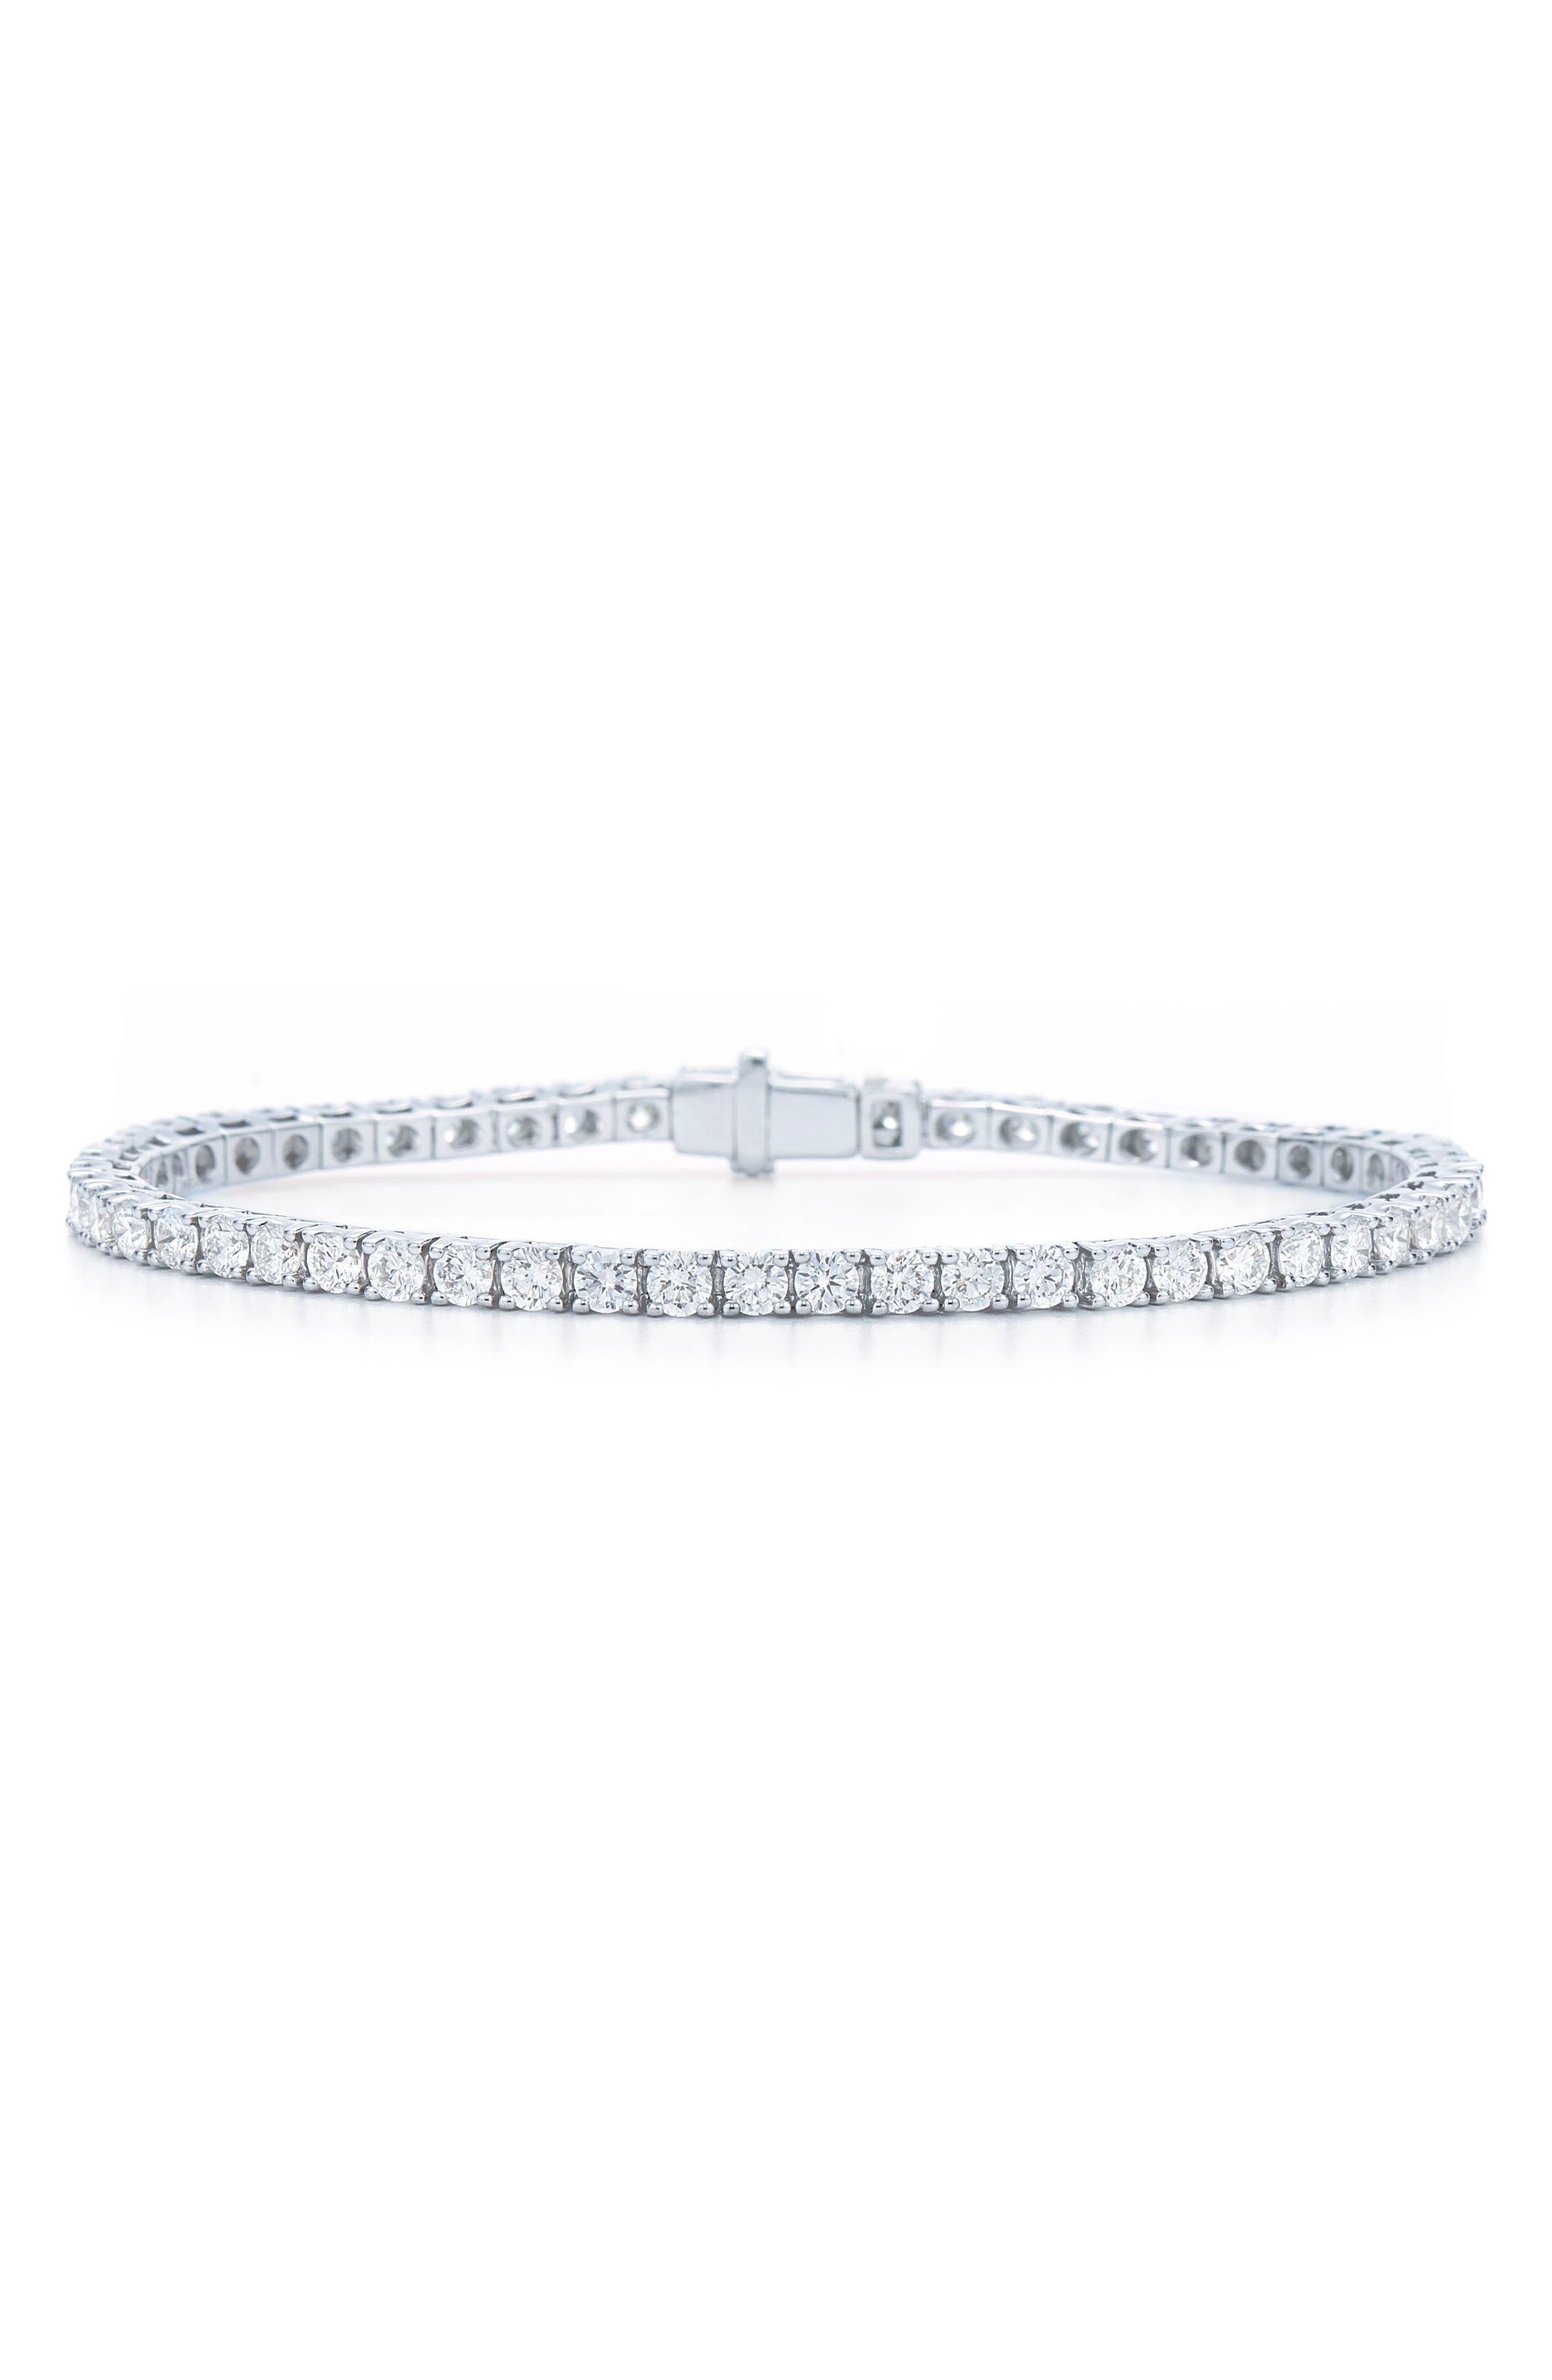 Riviera Diamond Line Bracelet,                             Main thumbnail 1, color,                             711